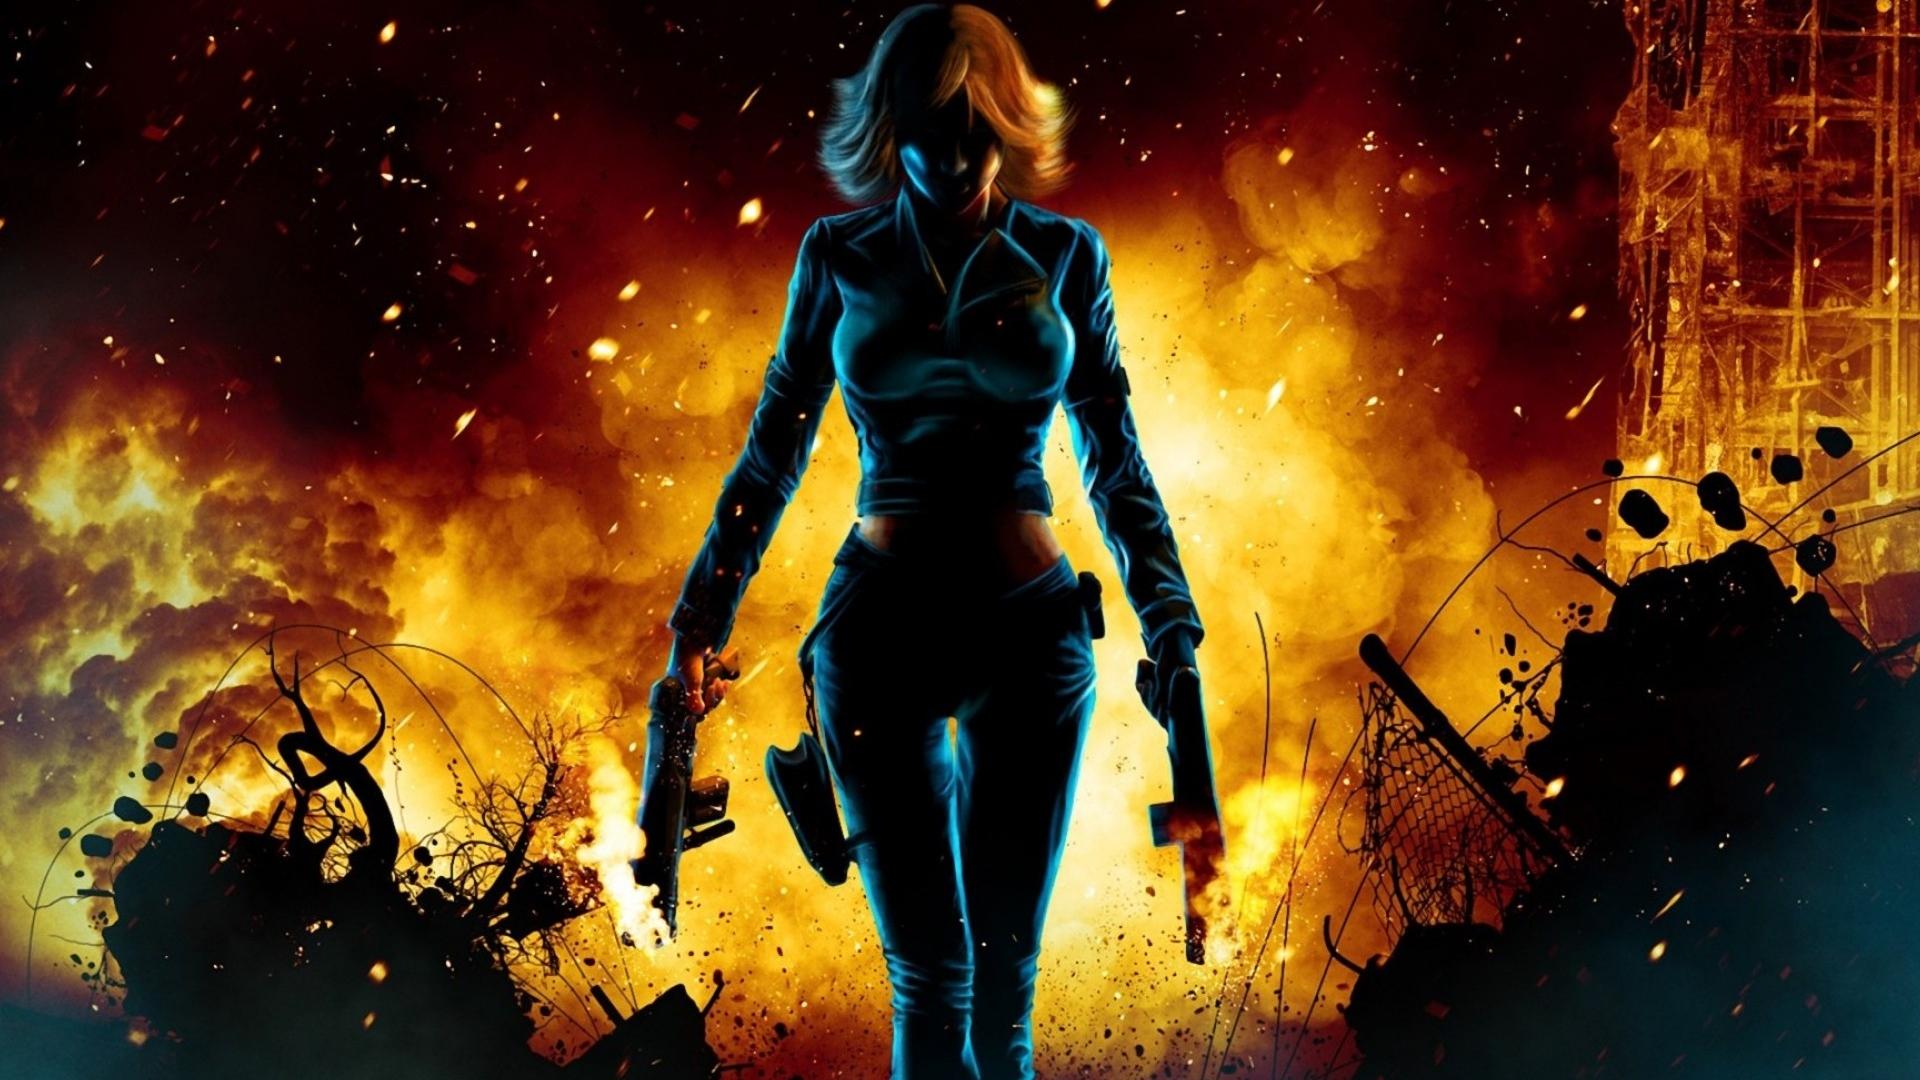 Black Widow HD Wallpaper | Background Image | 1920x1080 ...